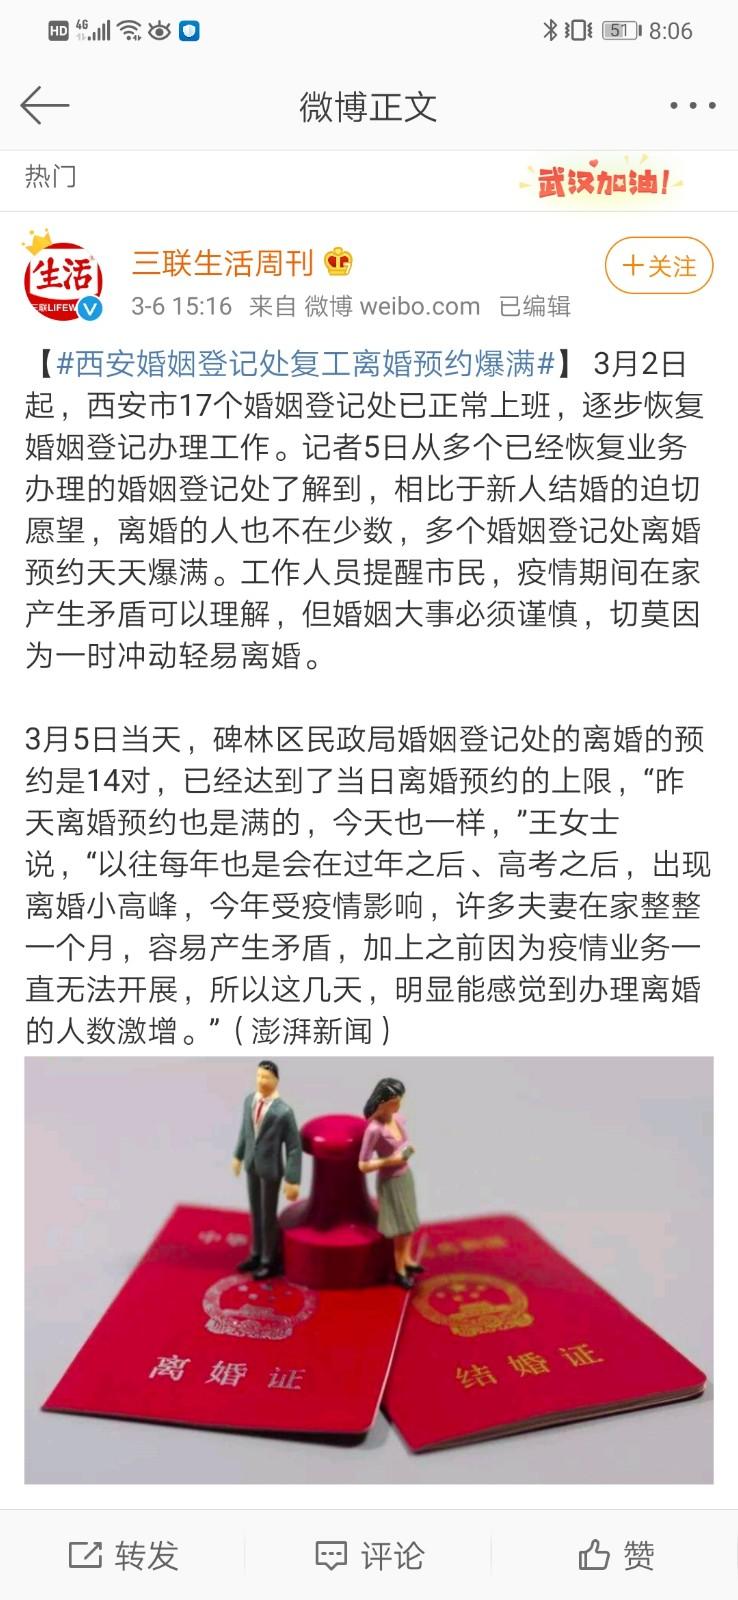 Screenshot_20200306_200634_com.sina.weibo.jpg